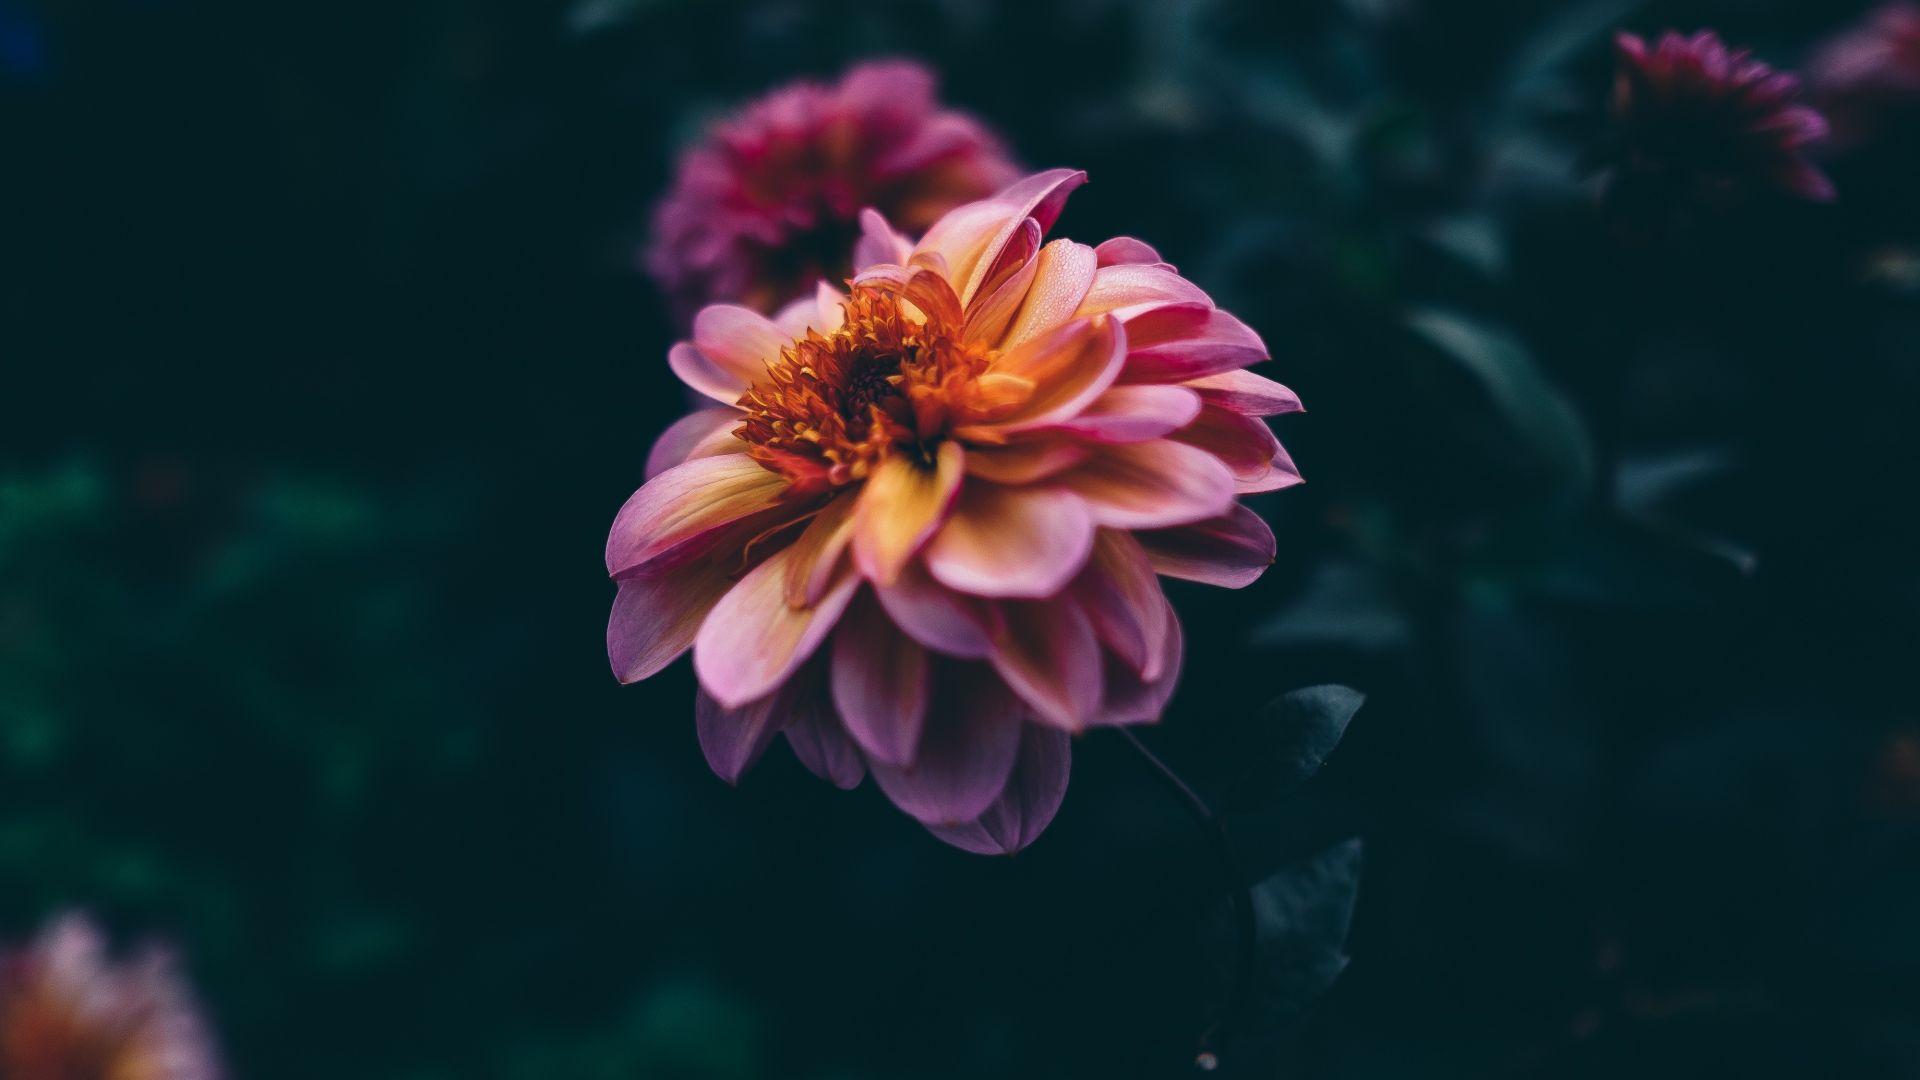 Dark Roses Hd Wallpapers: Wallpaper Flower, Pink, Purple, 4K, Nature #19707